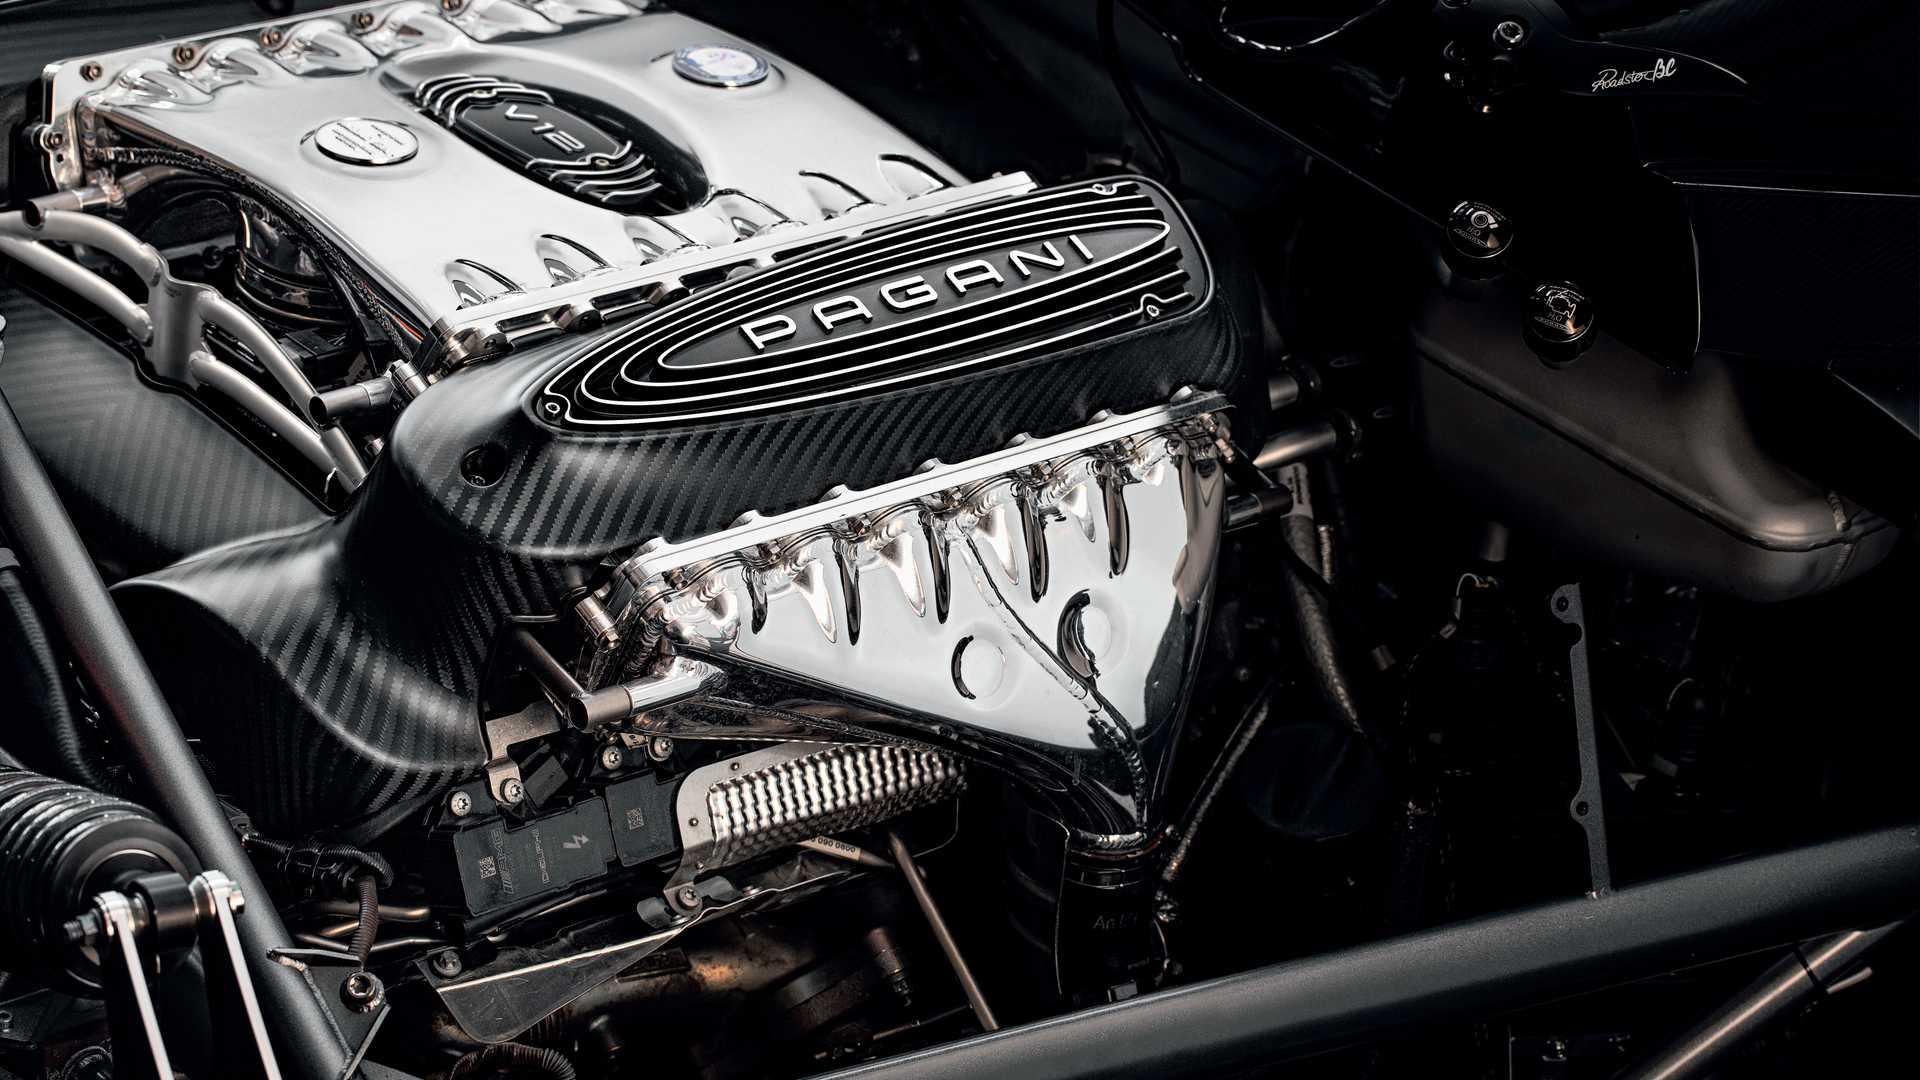 2019 Pagani Huayra Roadster Bc Engine Wallpapers 1920x1080 Download Hd Wallpaper Wallpapertip